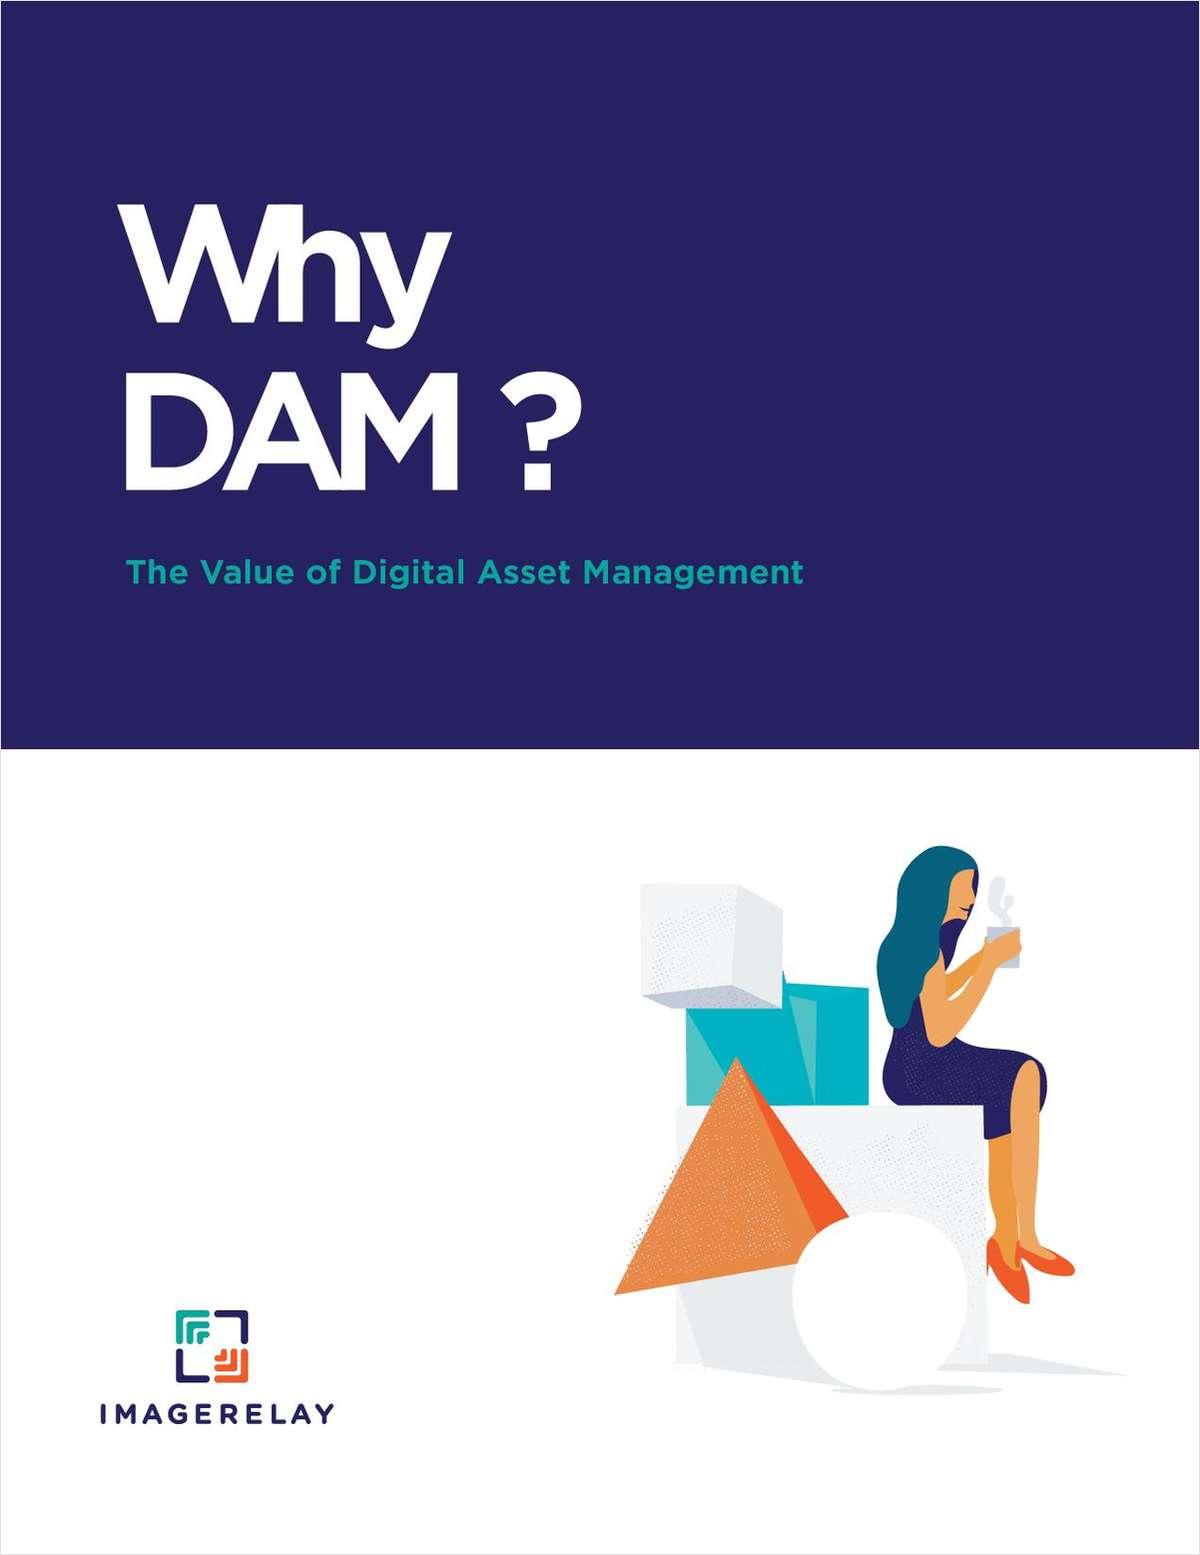 Why Digital Asset Management (DAM) for Your Marketing Organization?